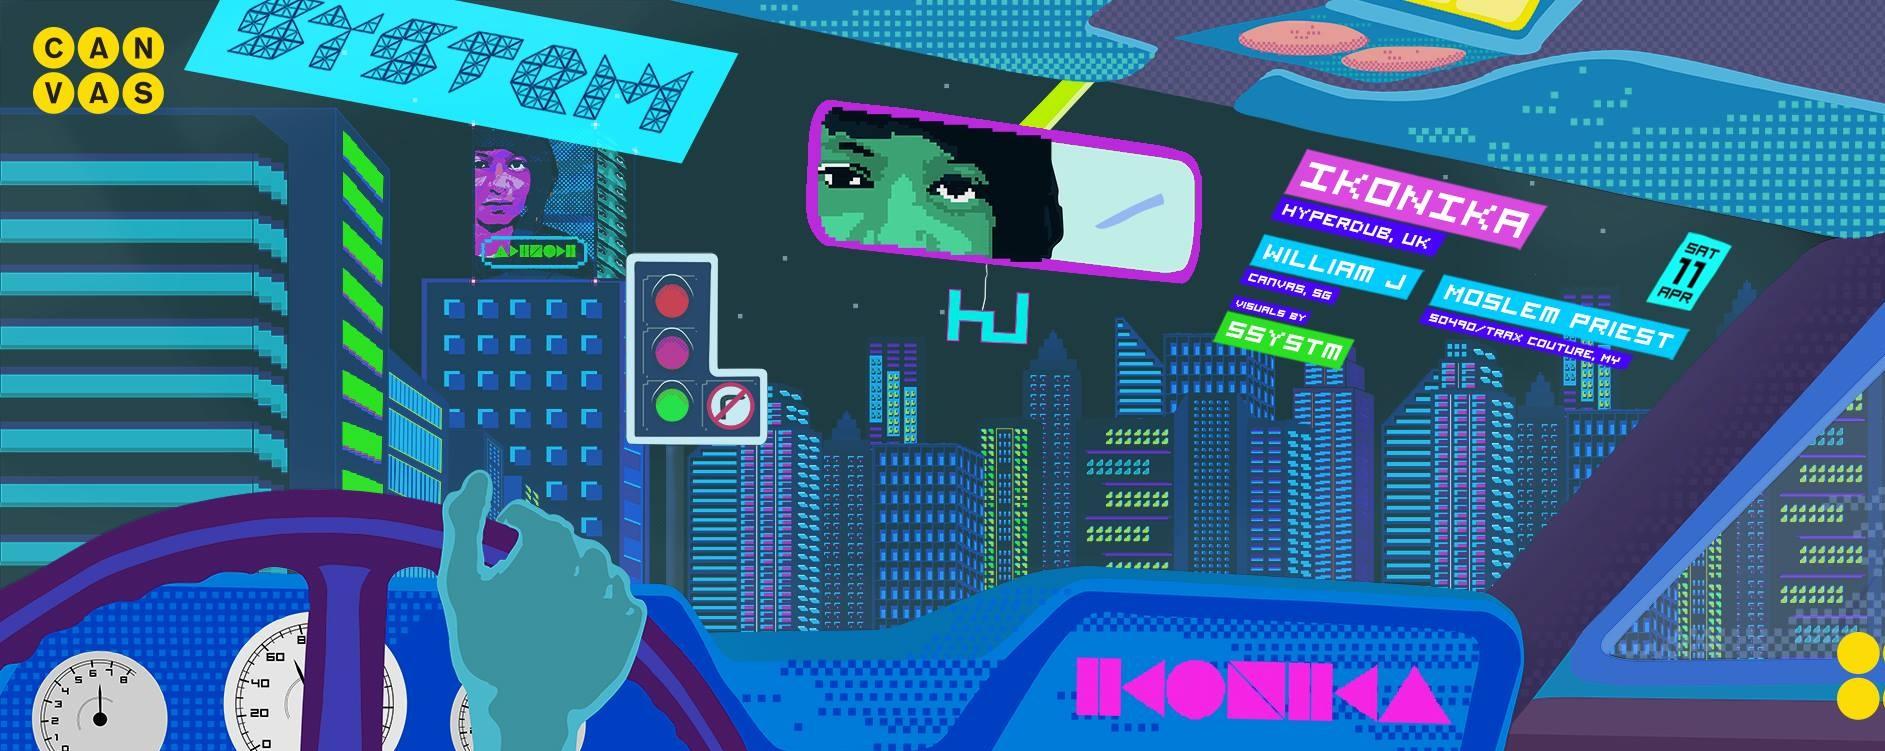 System ft. Ikonika (Hyperdub, UK)